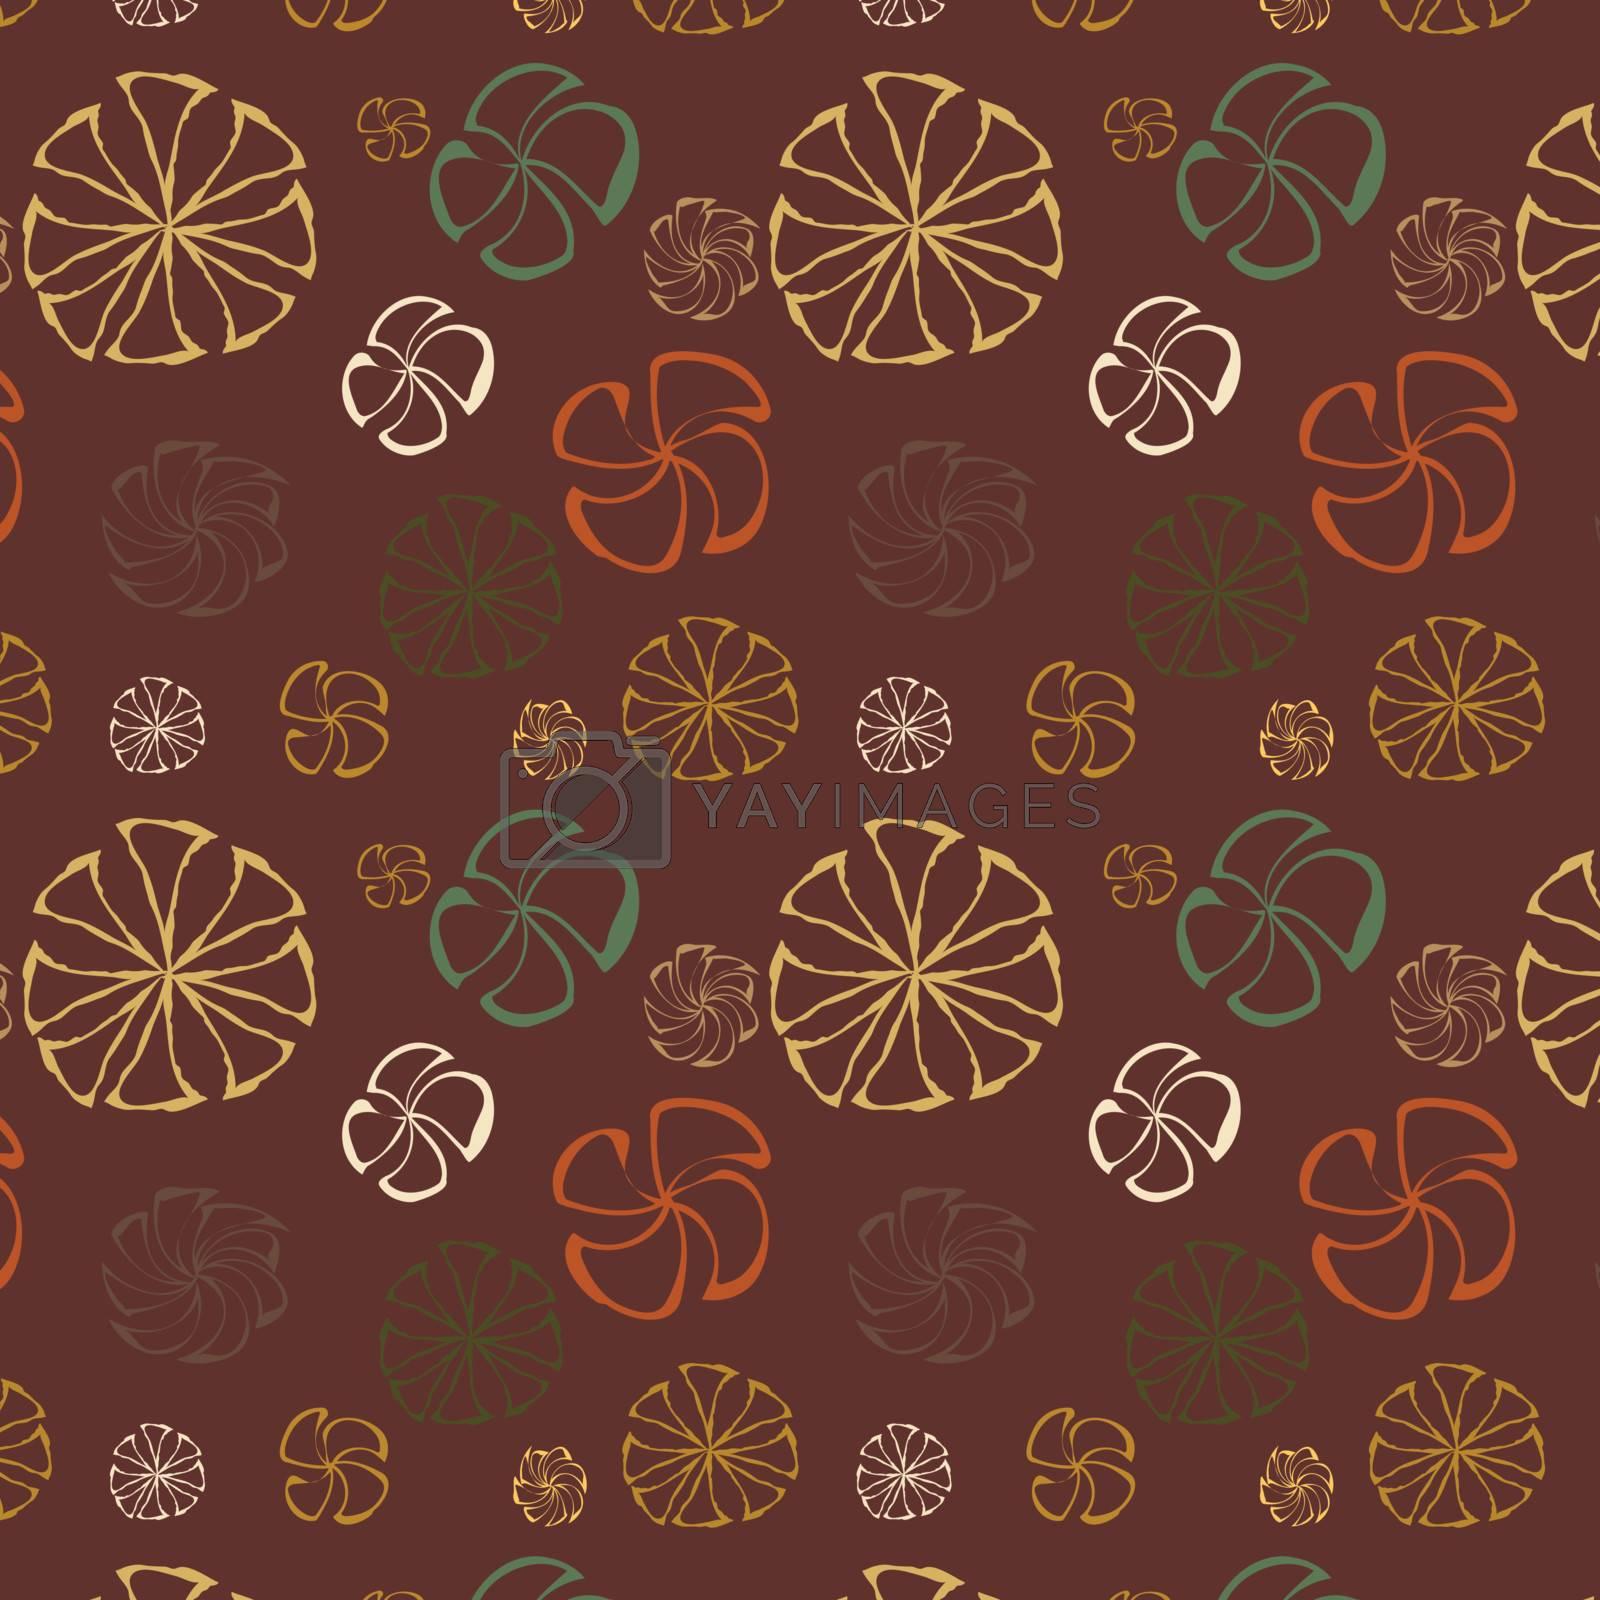 Floral seamless background, vector, illustration